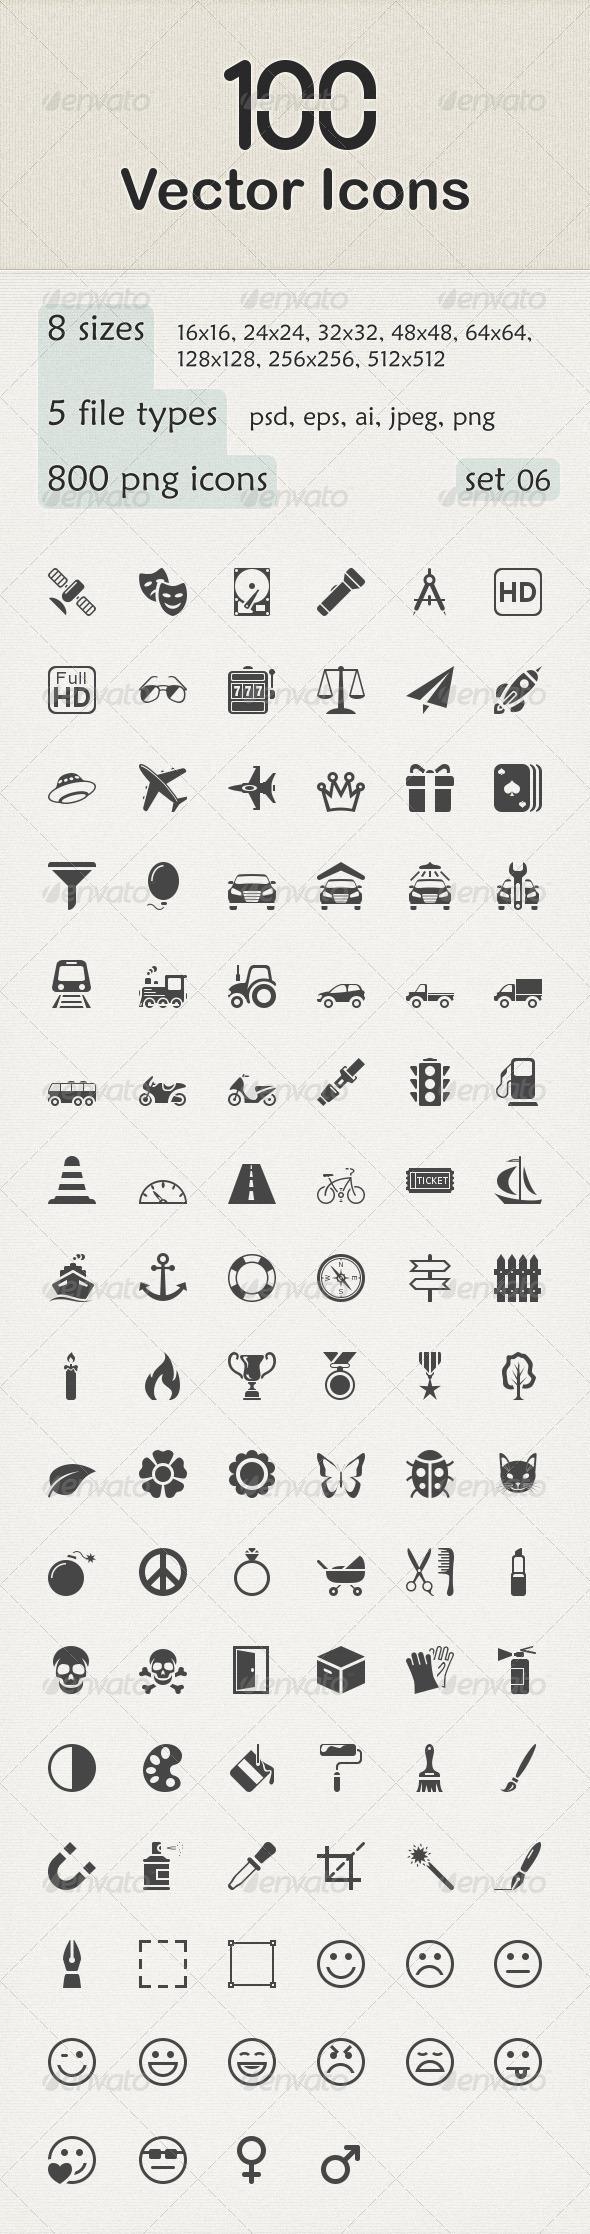 100 Vector Icons Vector Icons Icon Vector